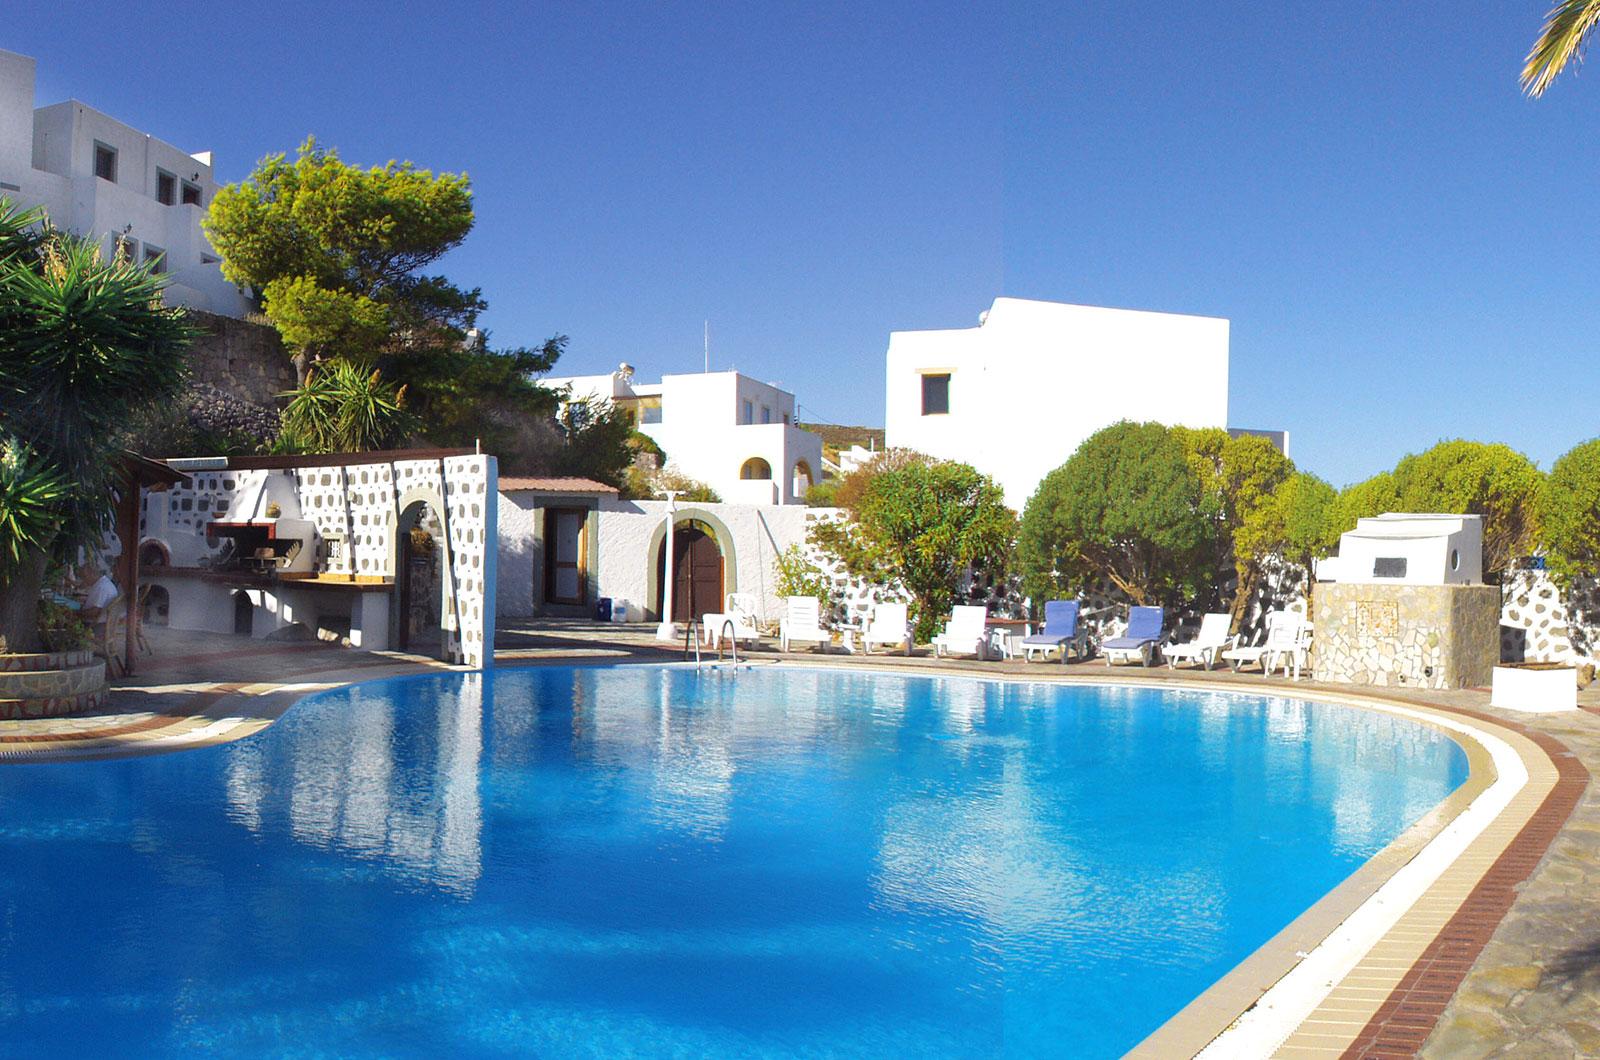 Anamar Patmos Hotel - Πάτμος ✦ -22% ✦ 2 Ημέρες (1 Διανυκτέρευση)